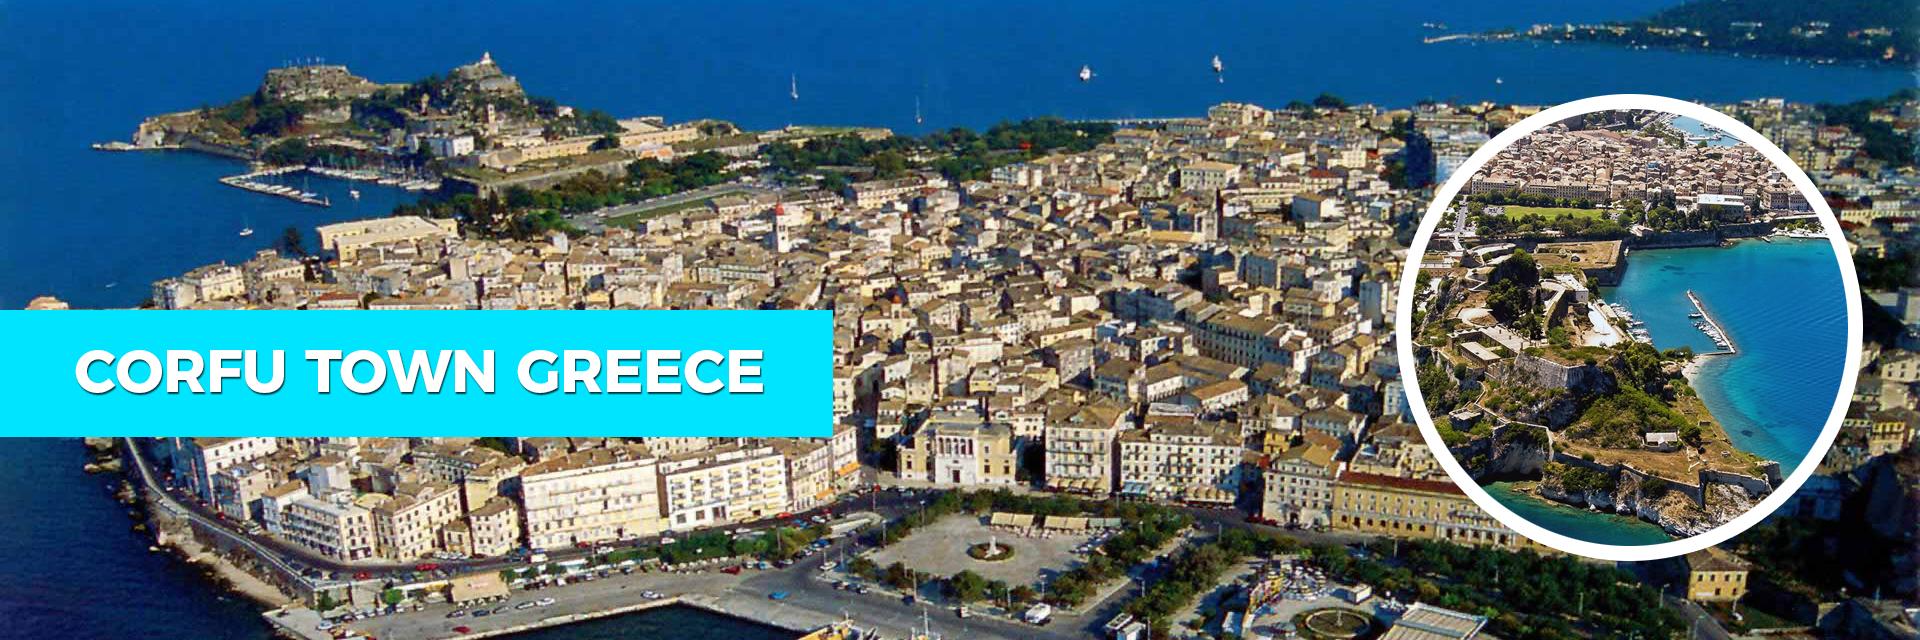 corfu city greece